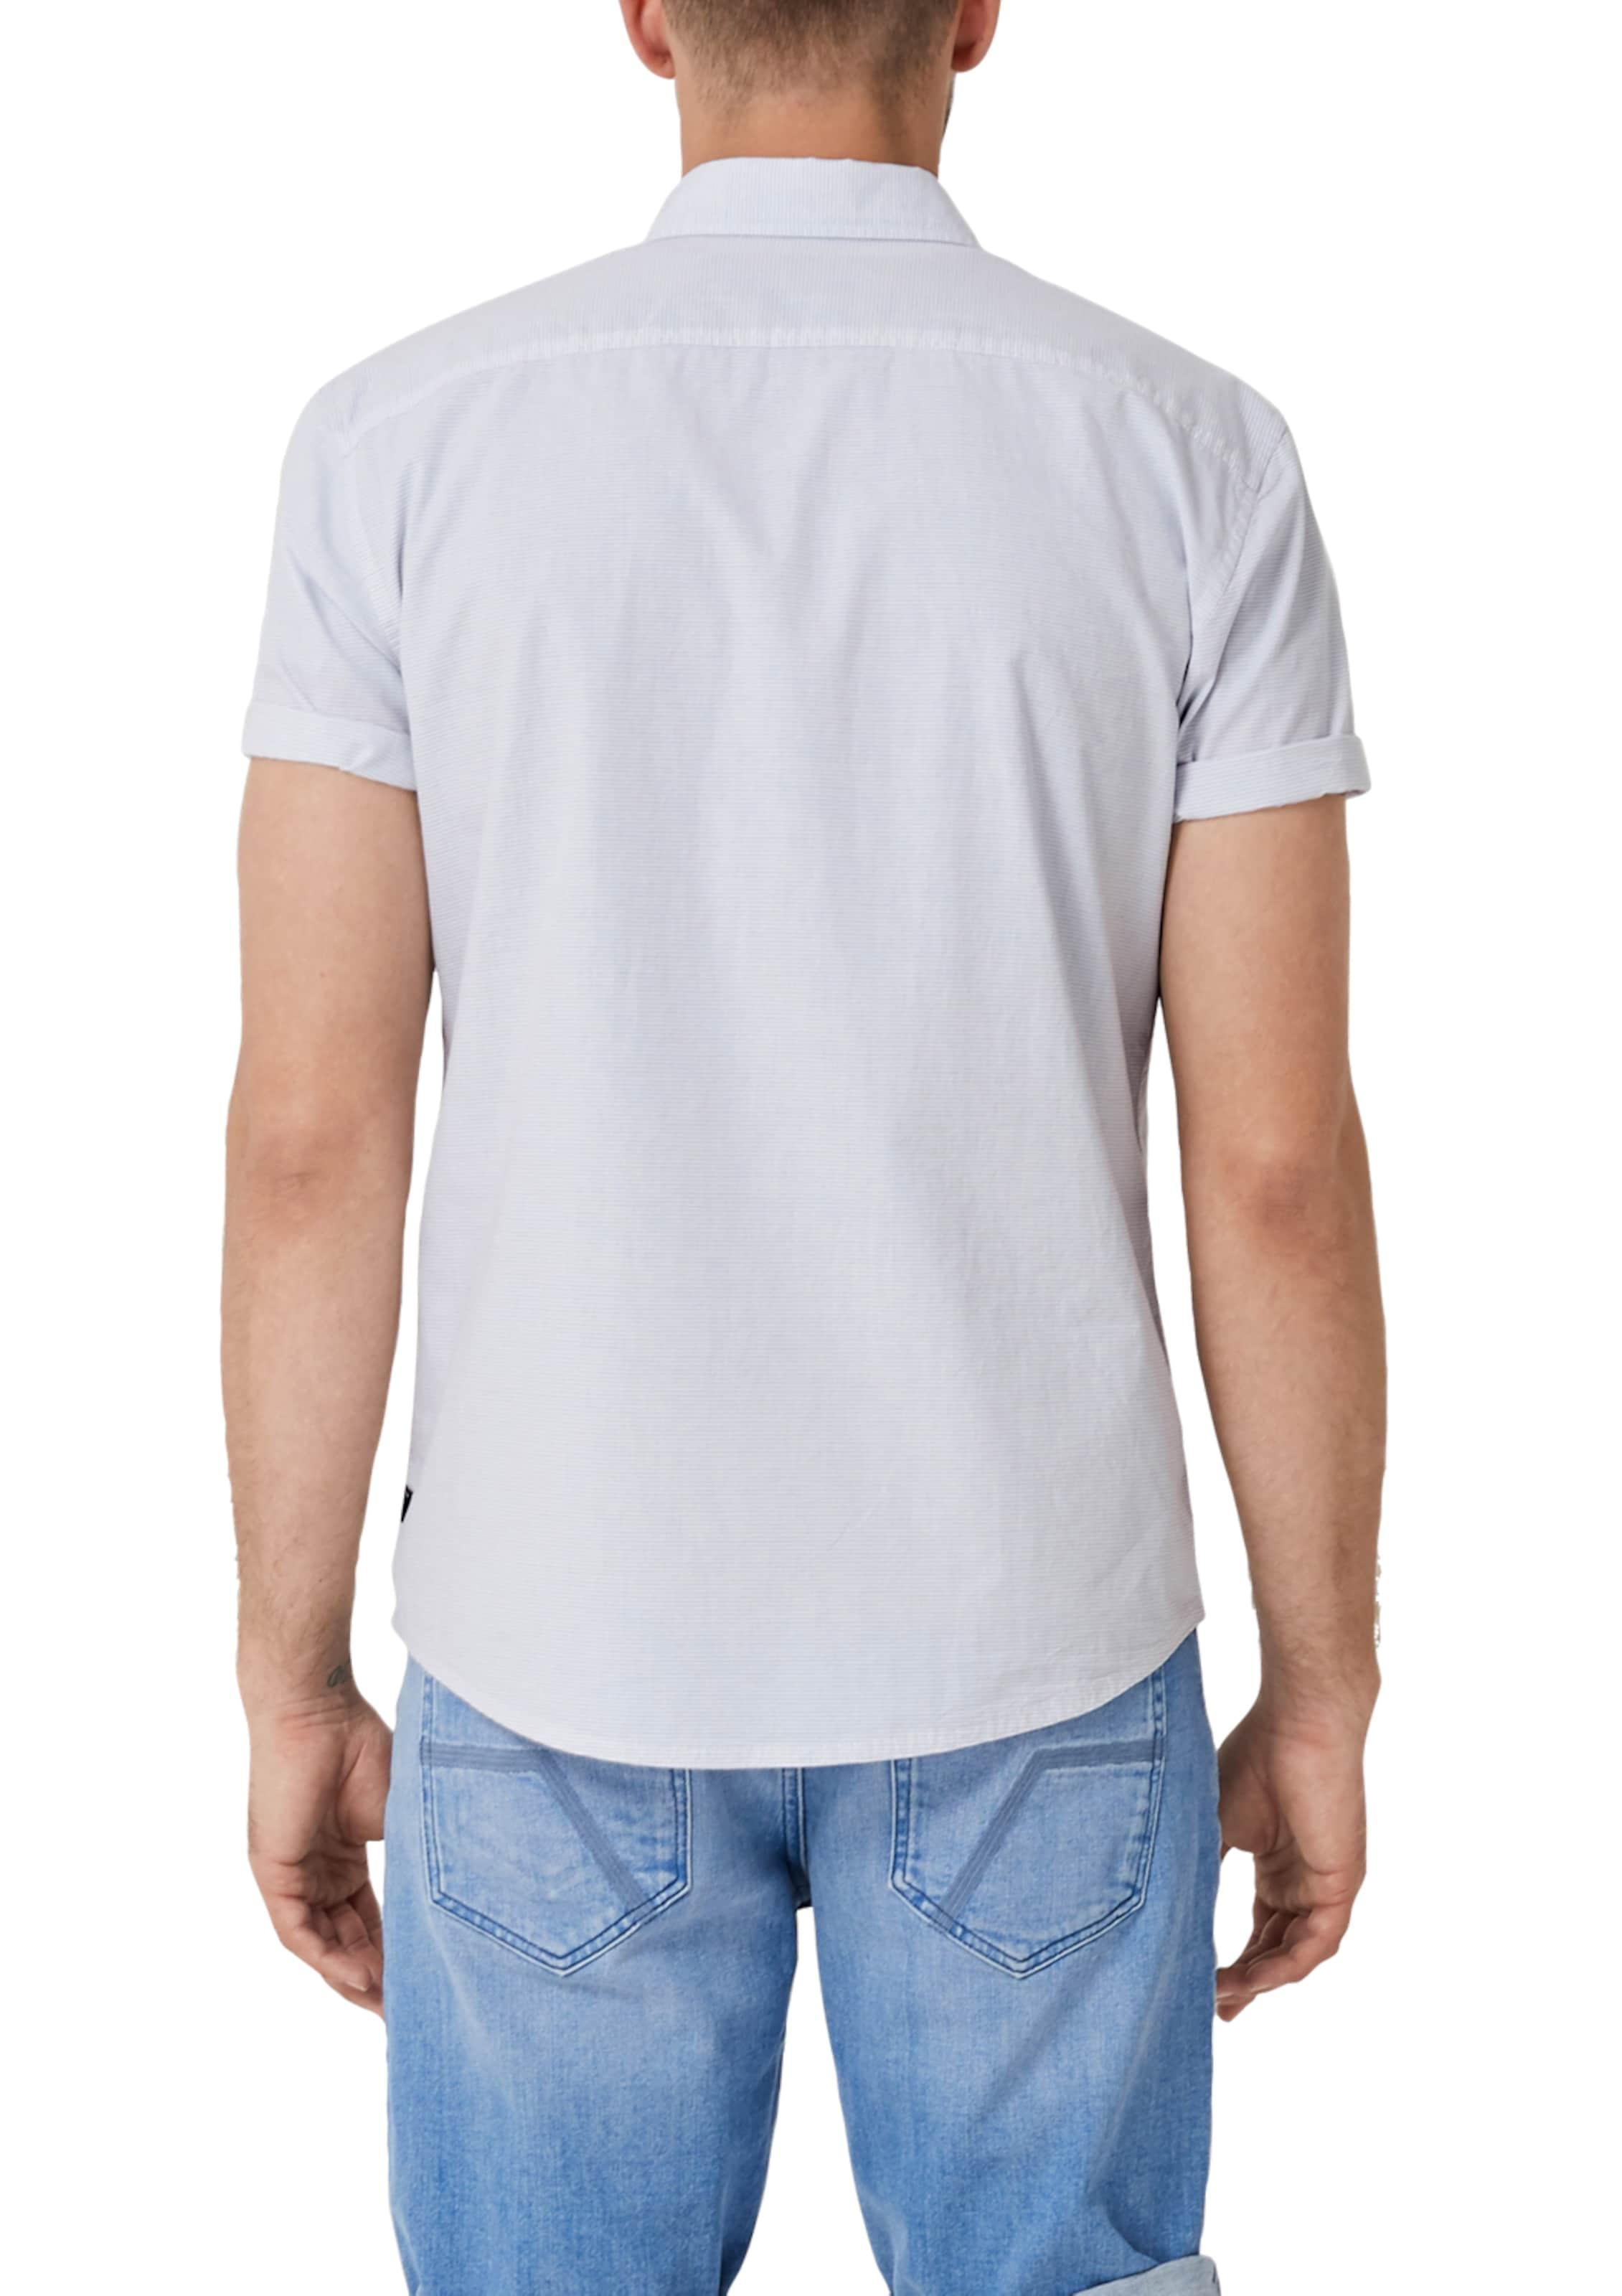 oliver Label TaubenblauWeiß In Hemd S Red rCxWdBoe